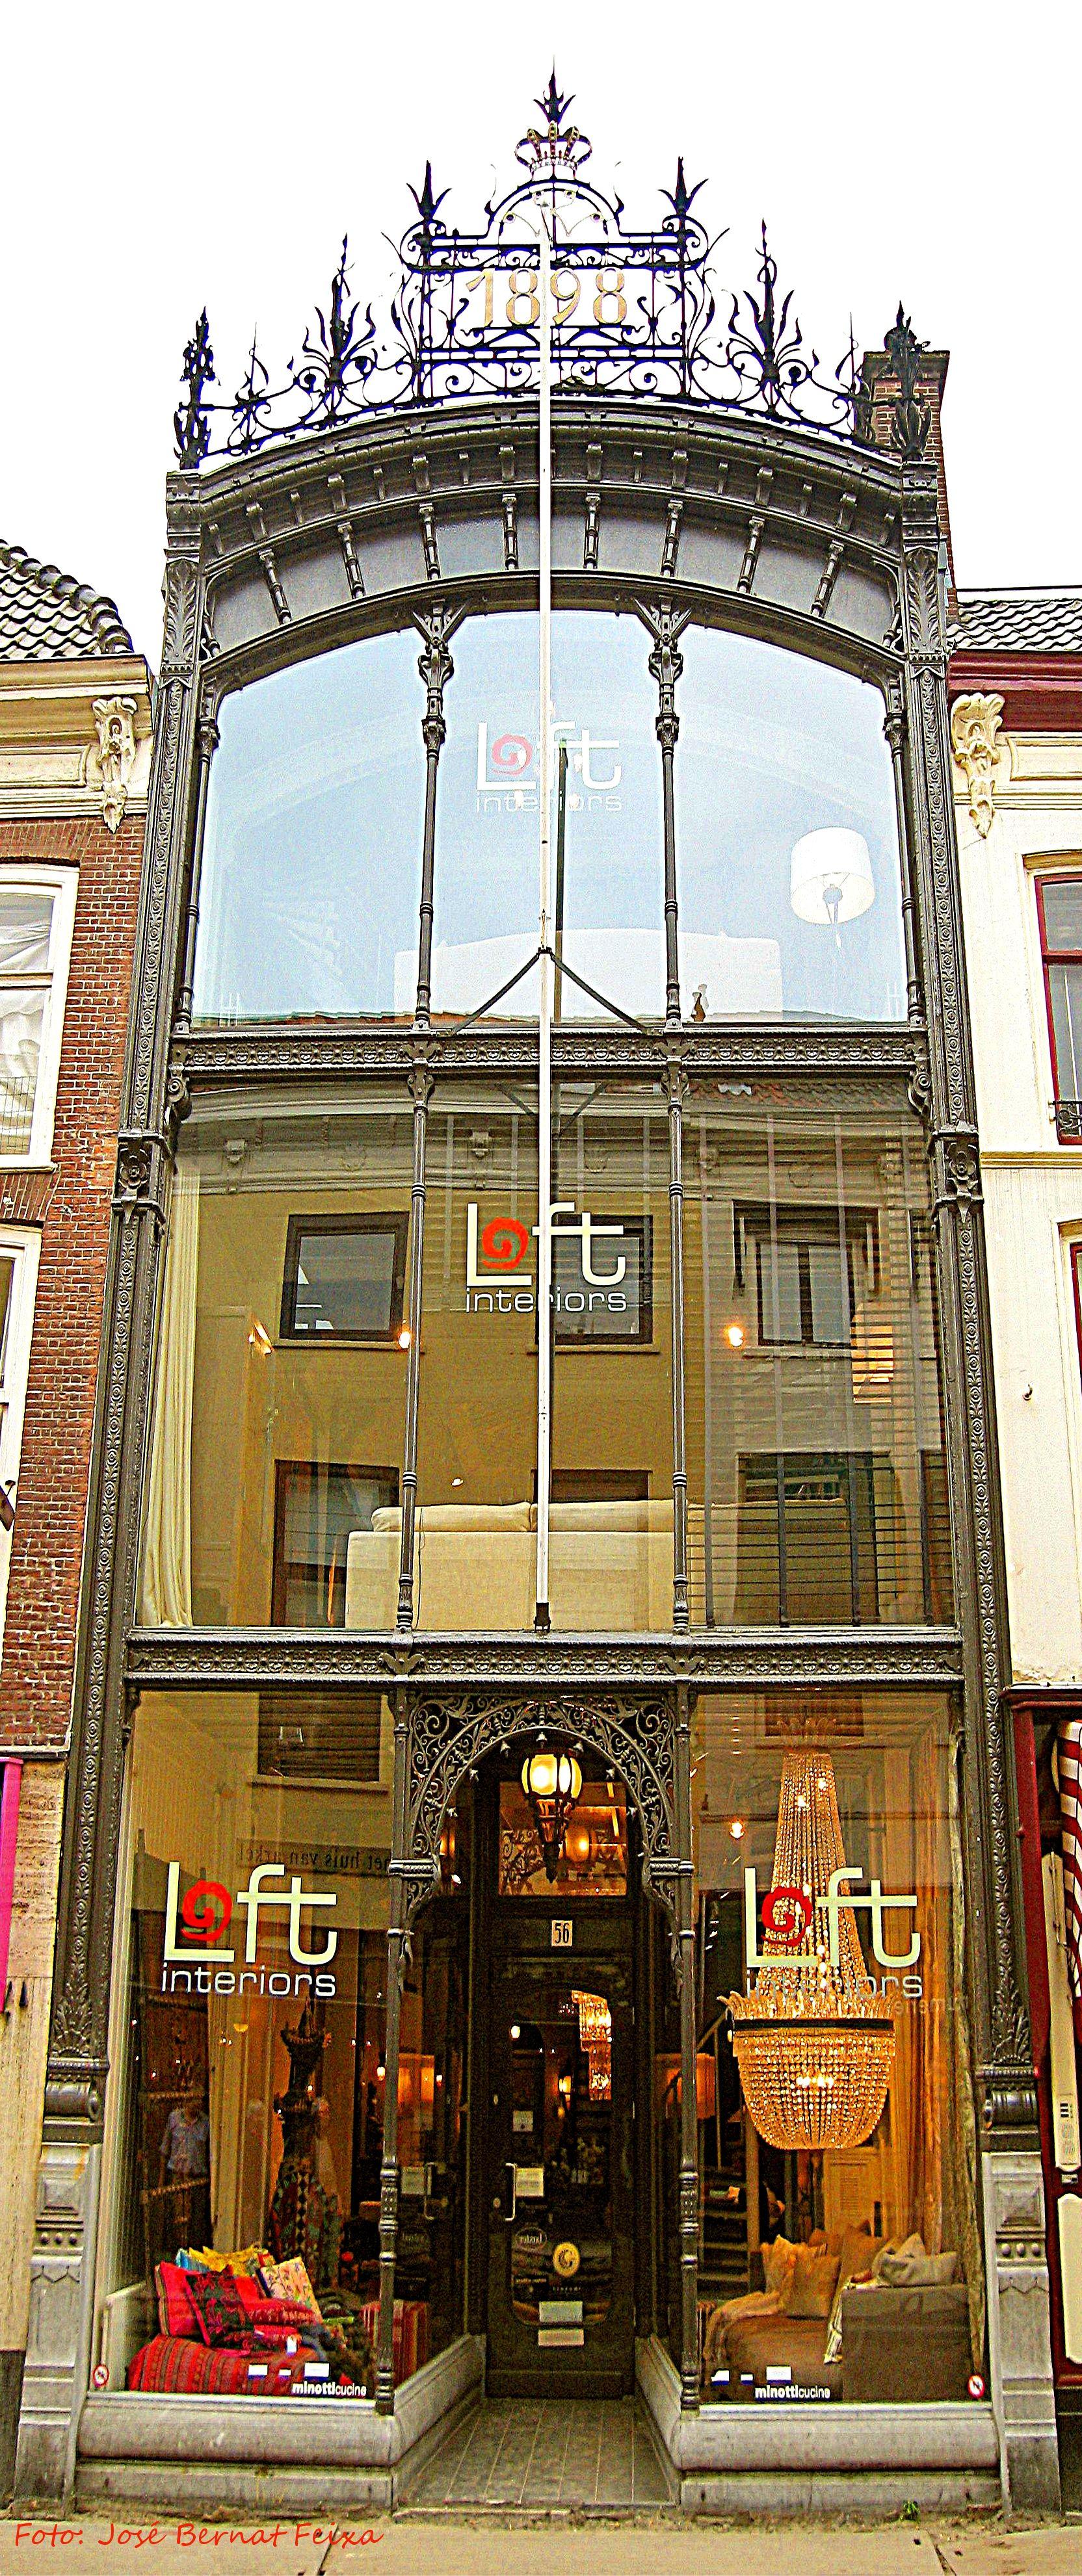 Den Haag, Varkenmarkt/Assendelftstraat Willibrorduskerk